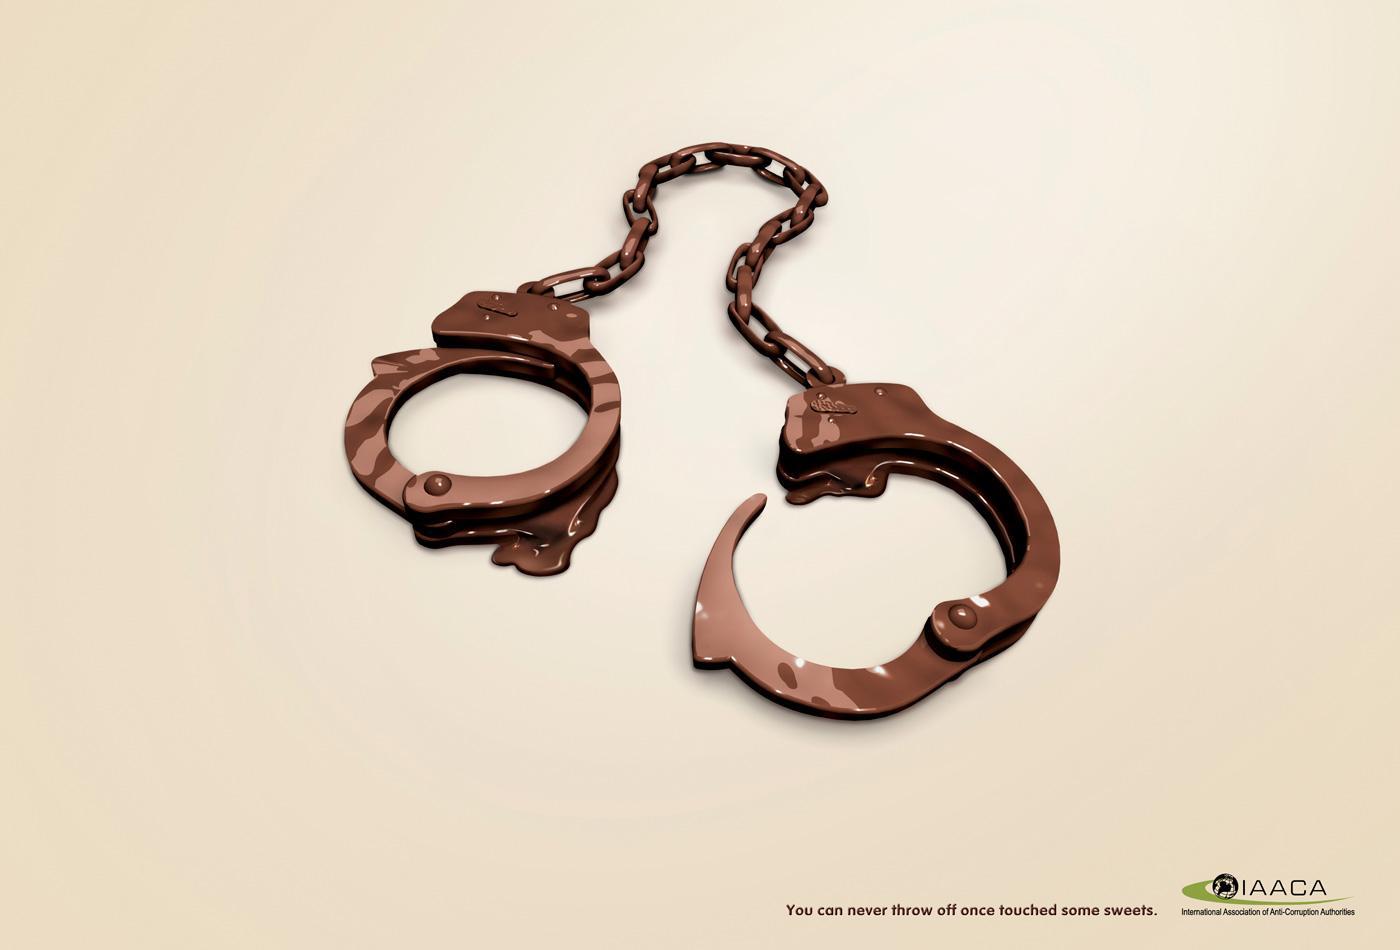 IAACA Print Ad -  Handcuffs